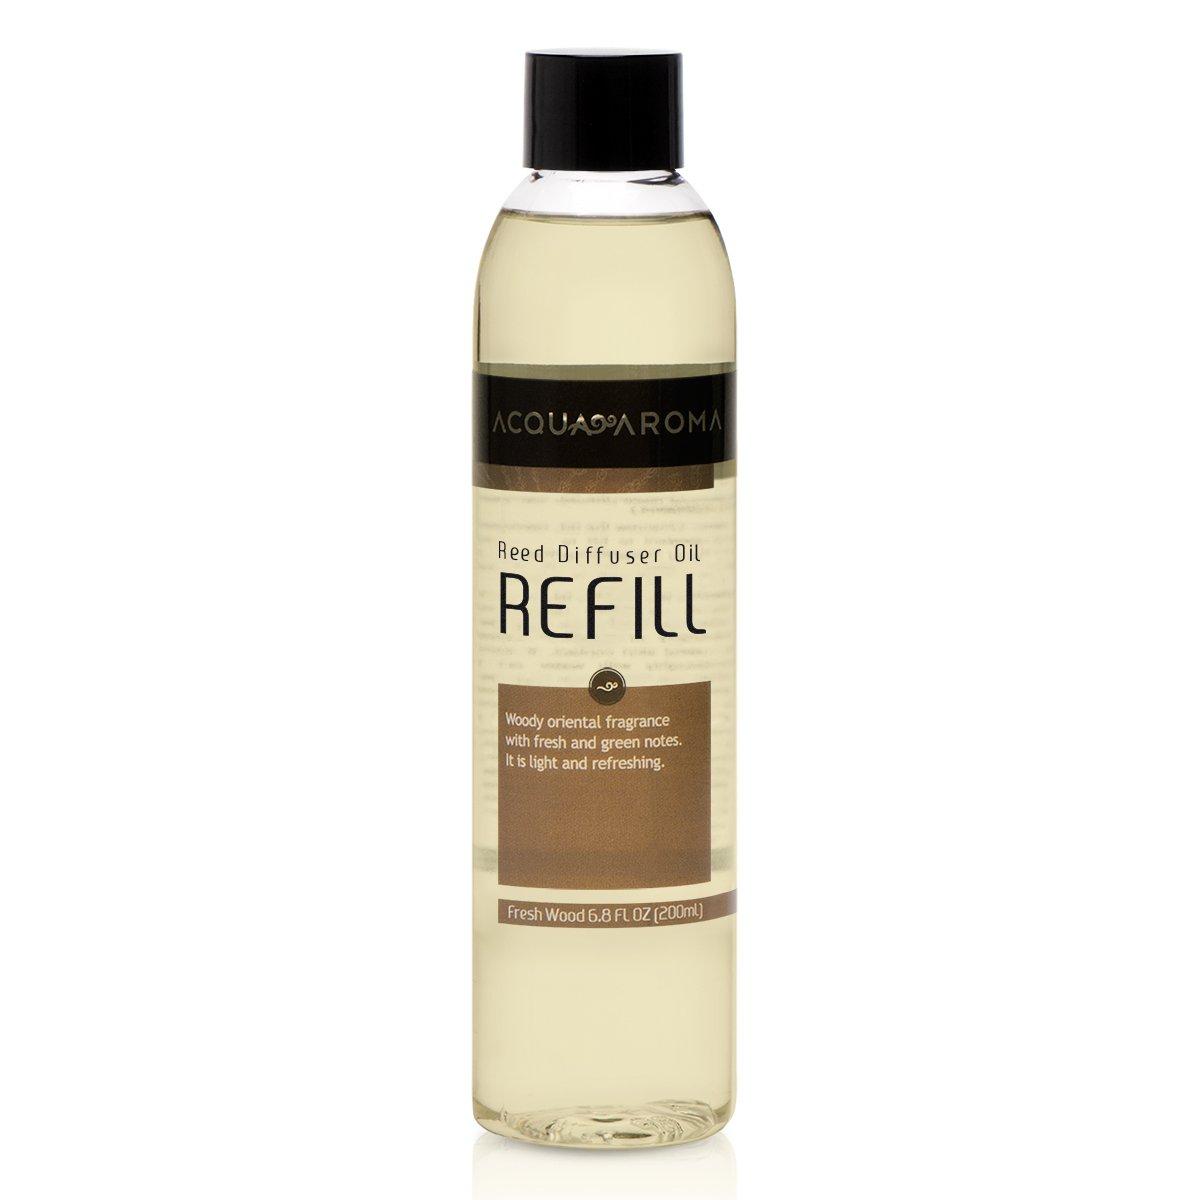 Acqua Aroma Fresh Wood Reed Diffuser Oil Refill 6.8 FL OZ (200ml) Contains Essencial Oils